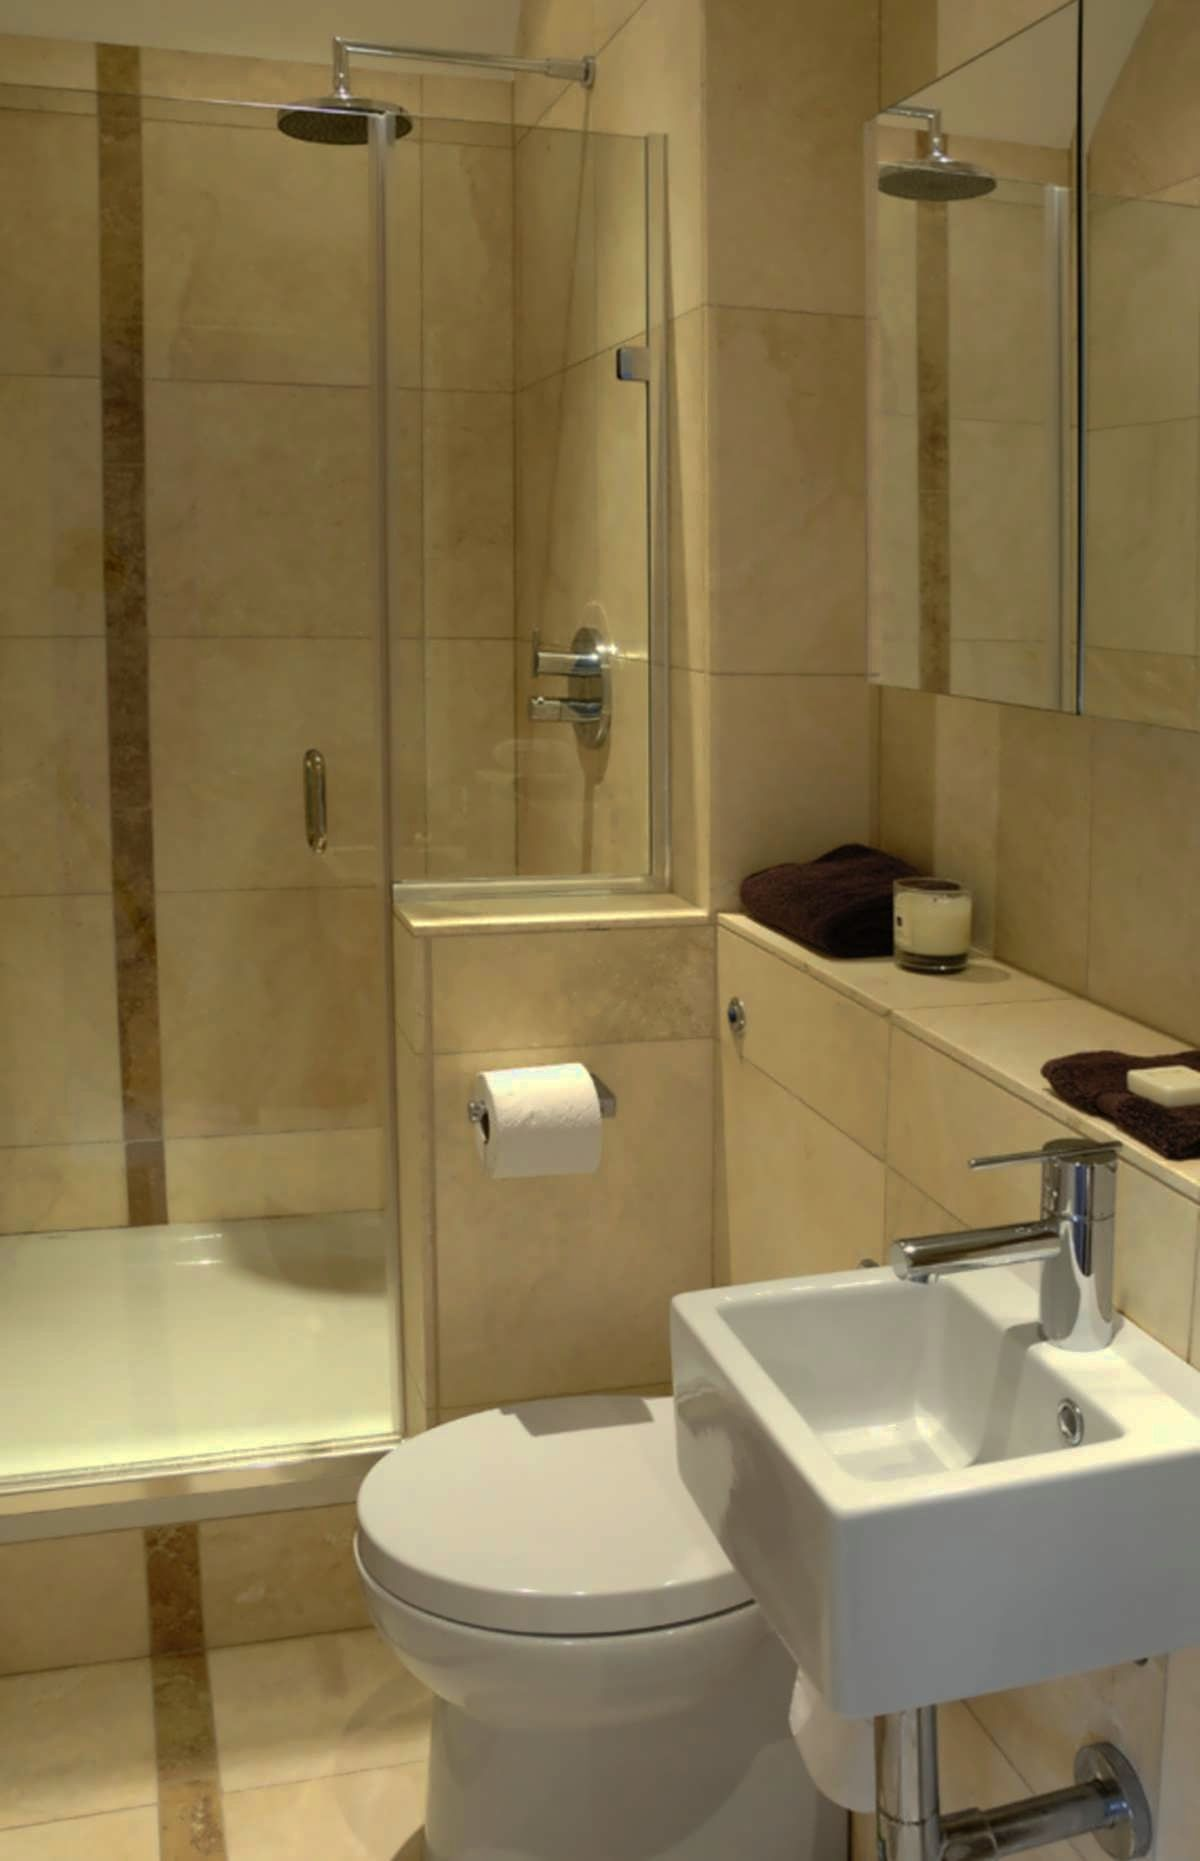 pin by andin on home design decor interior bathroom design small rh pinterest com bathroom tiles design in karachi